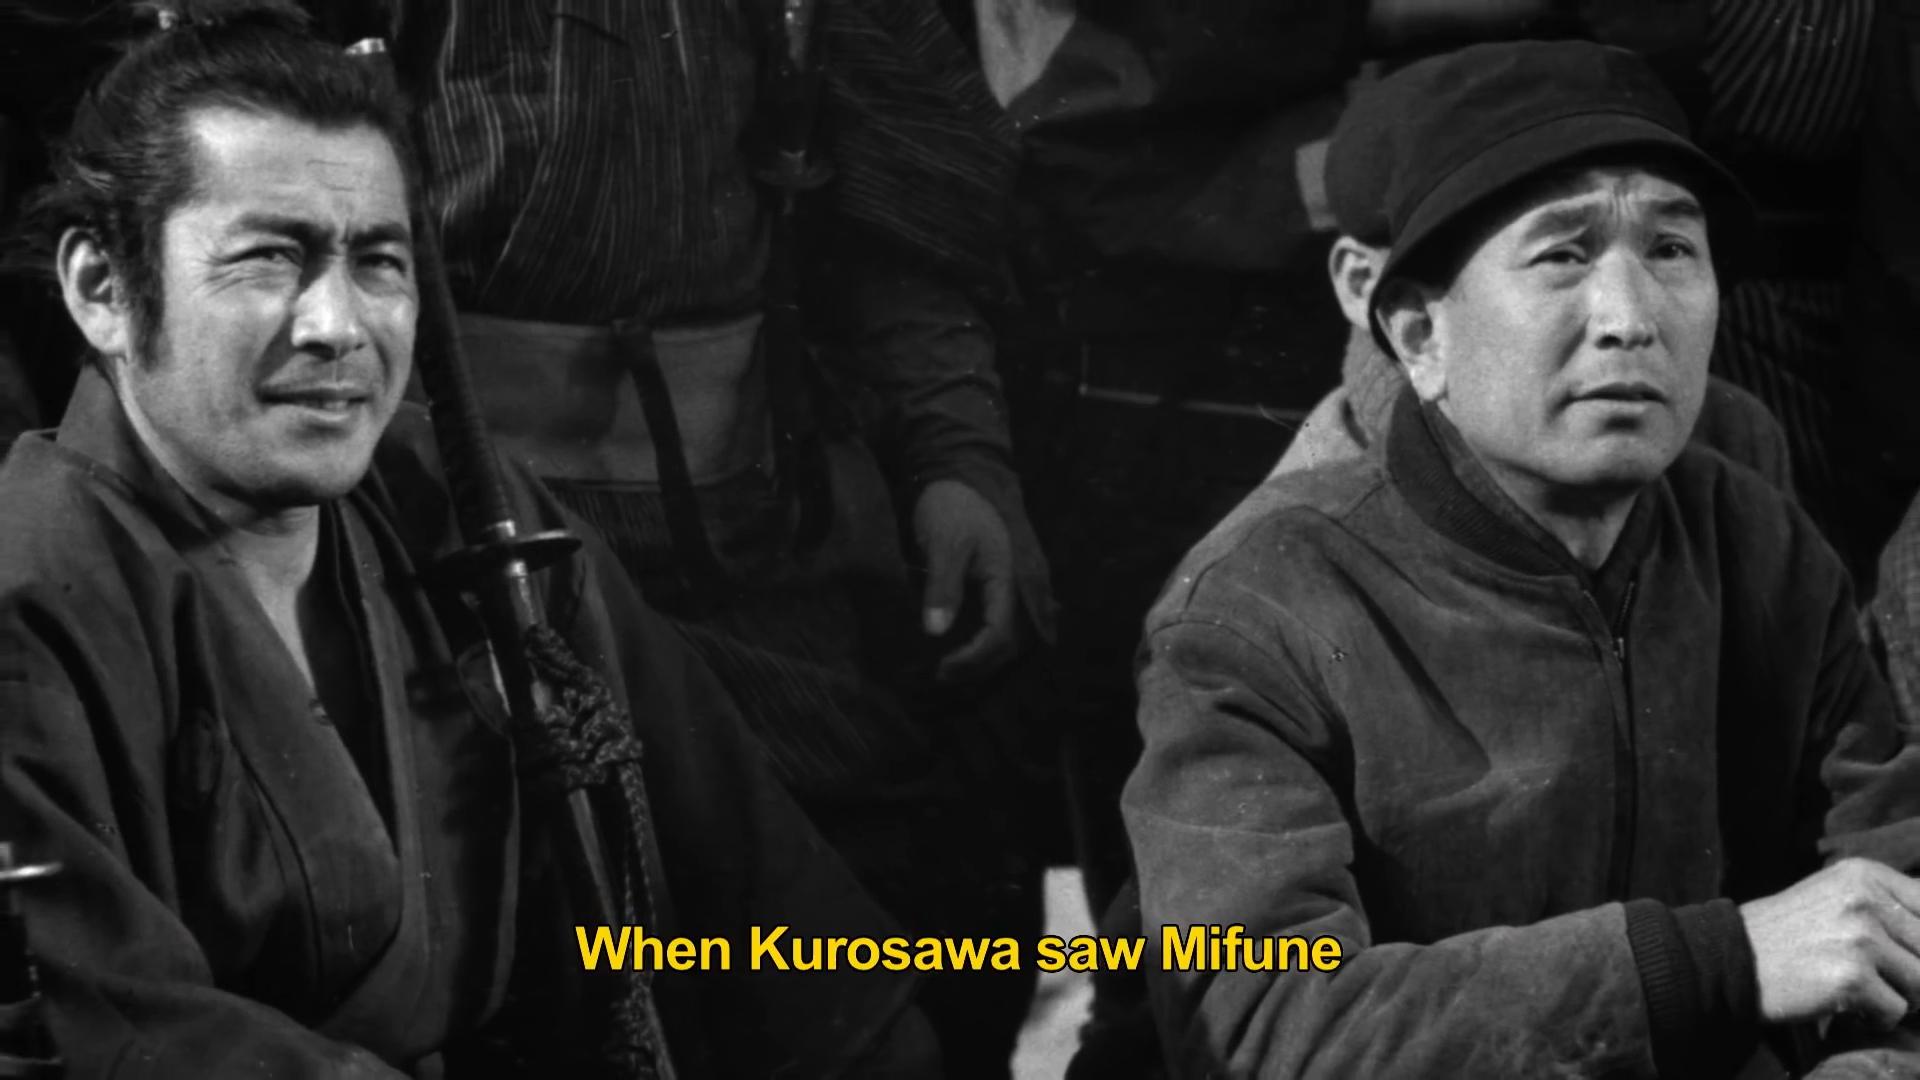 『MIFUNE』YOUTUBE予告編より 黒澤監督と